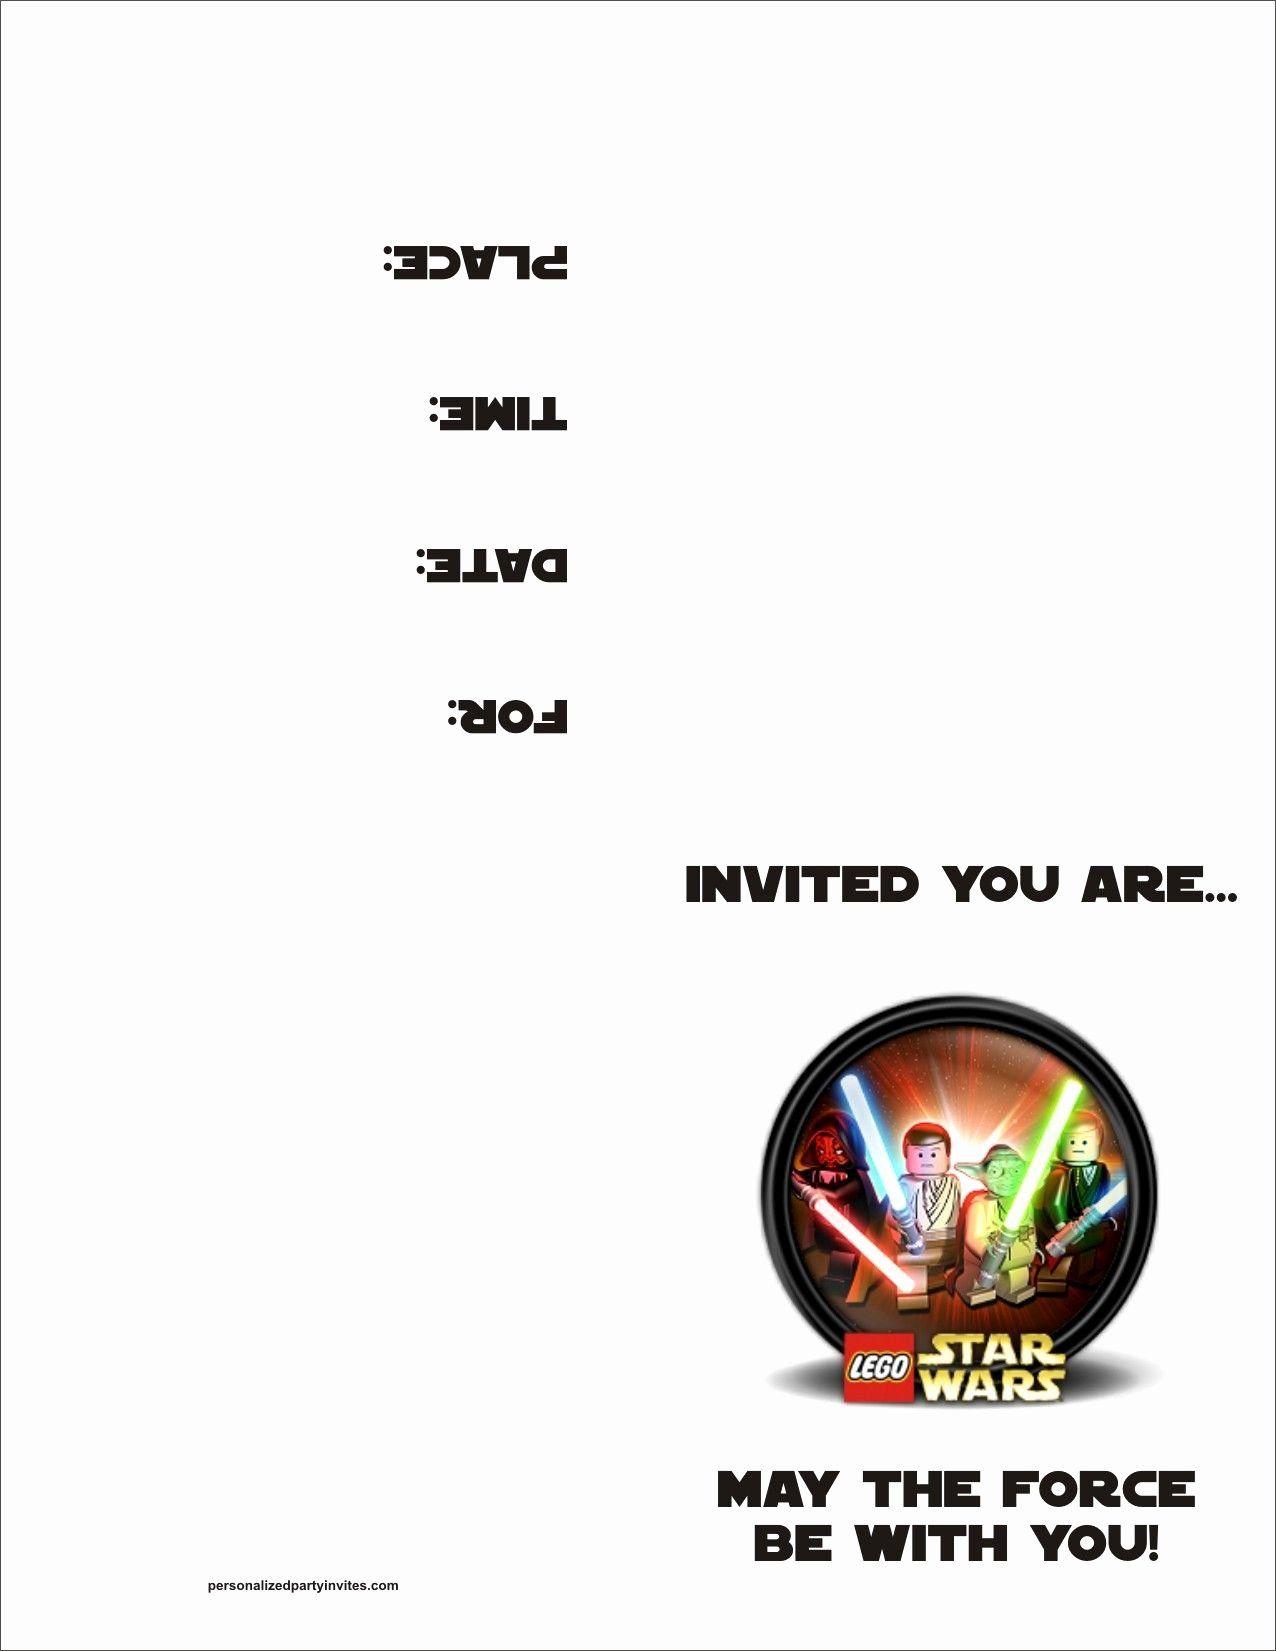 Star Wars Personalized Birthday Invitations New Lego Star Wars Free Printable Birth Star Wars Invitations Lego Star Wars Birthday Star Wars Birthday Invitation